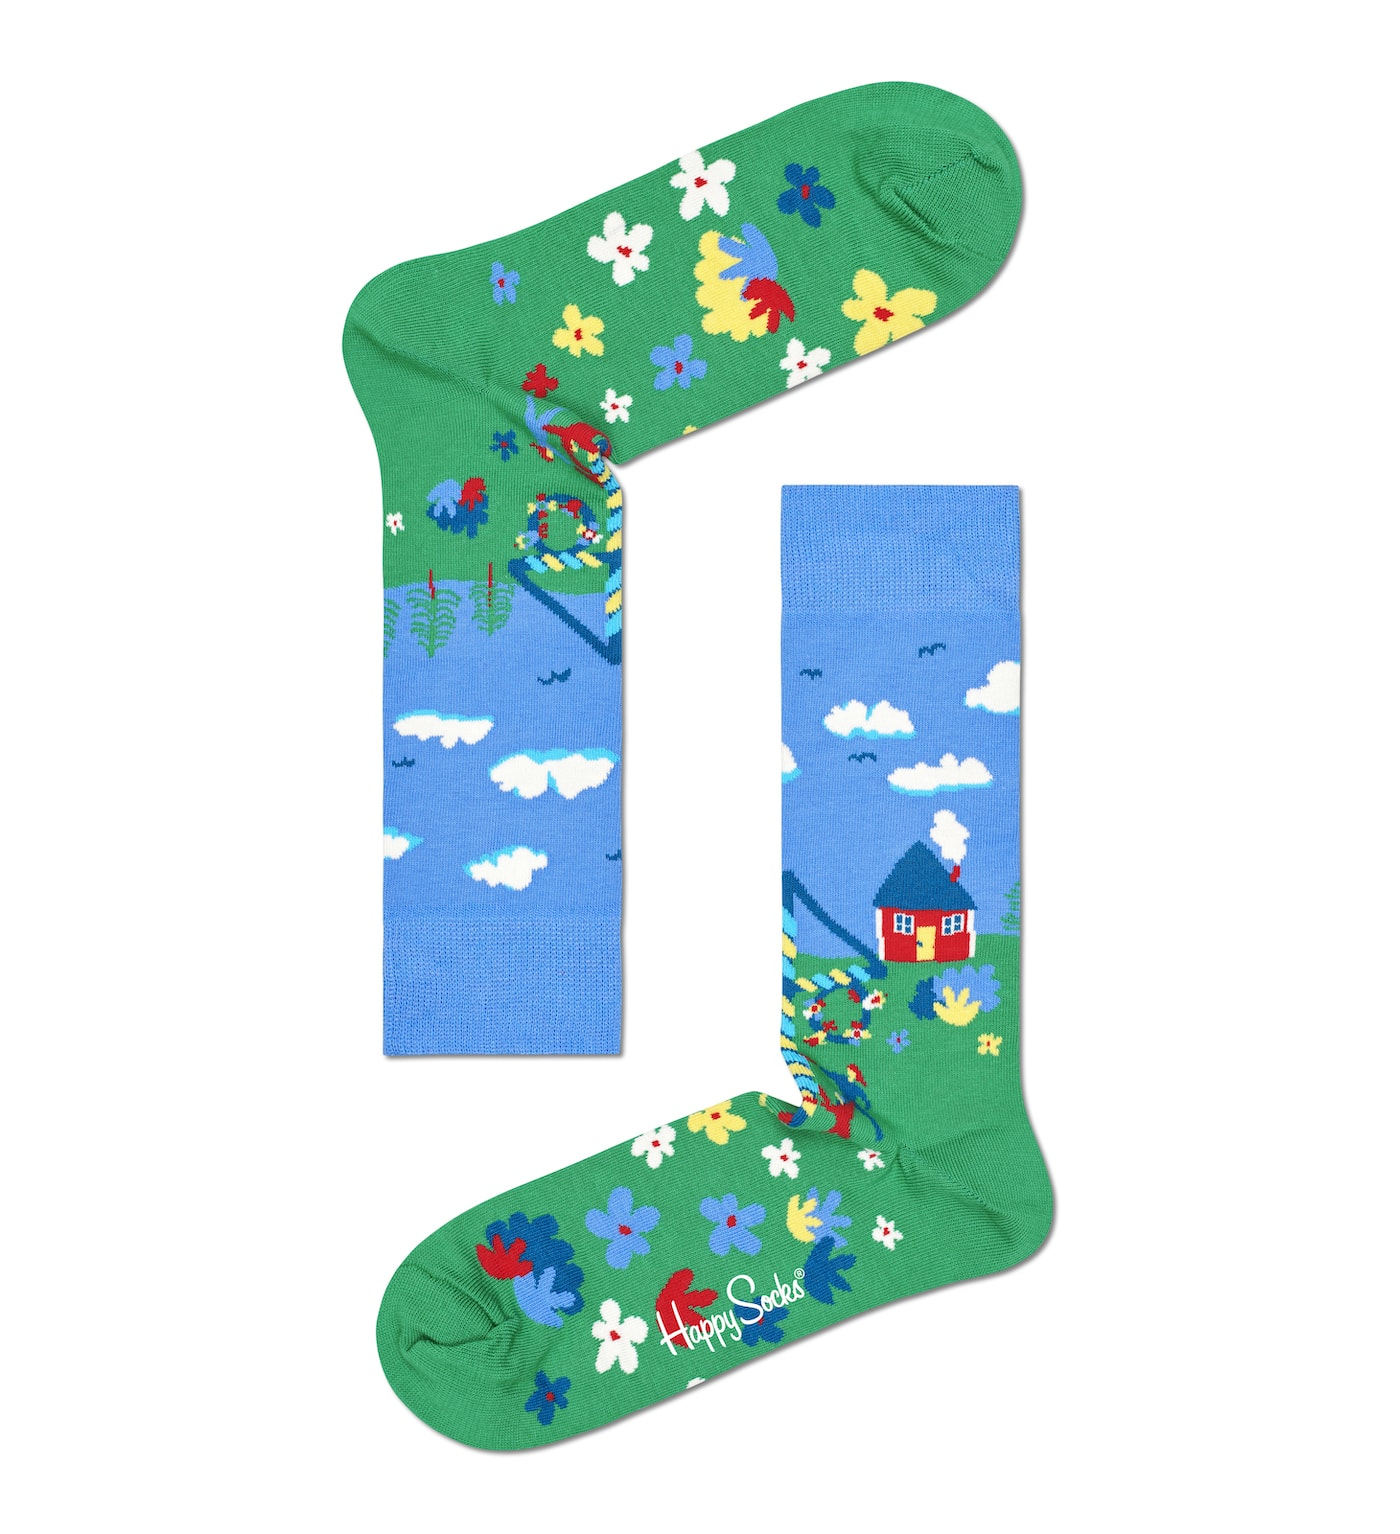 Mittsommer, Midsummer, Midsommar, Happy Socks, Schweden, Mittsommerfest